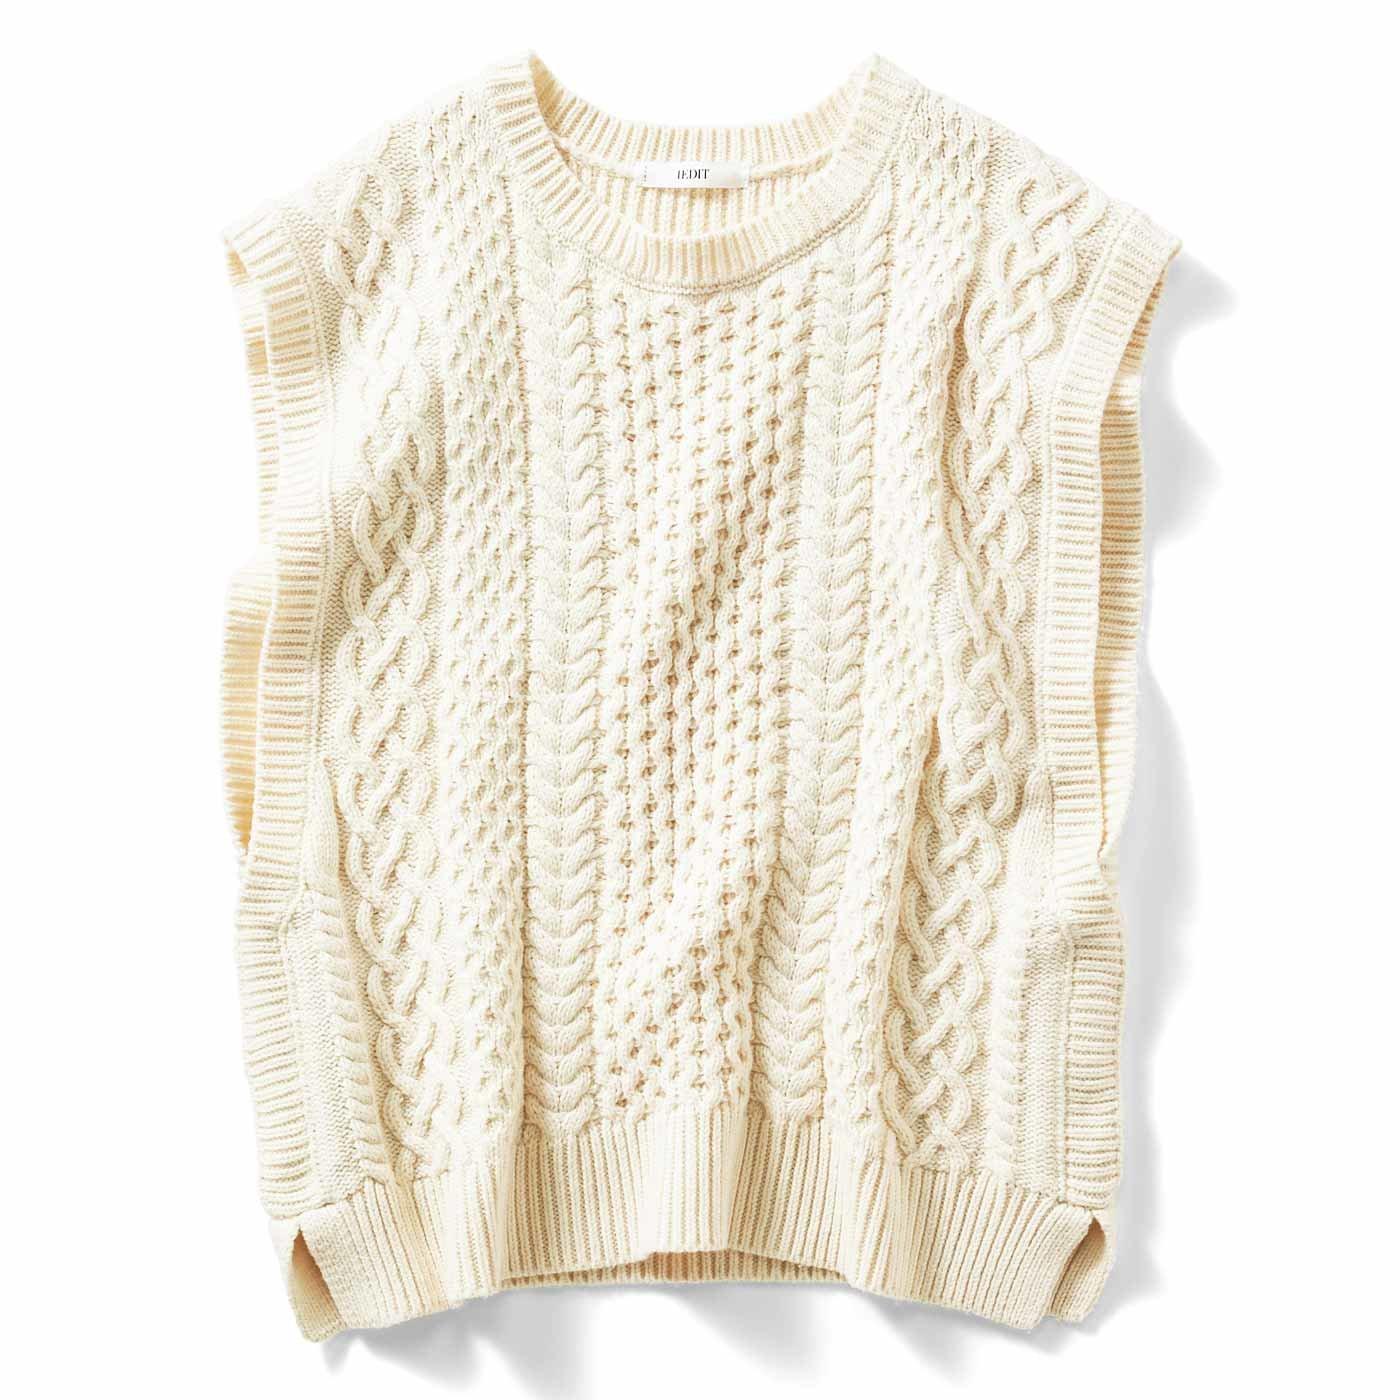 IEDIT[イディット] 小森美穂子さんとコラボ オンするだけで旬顔 こだわり素材の編み柄ニットベスト〈アイボリー〉